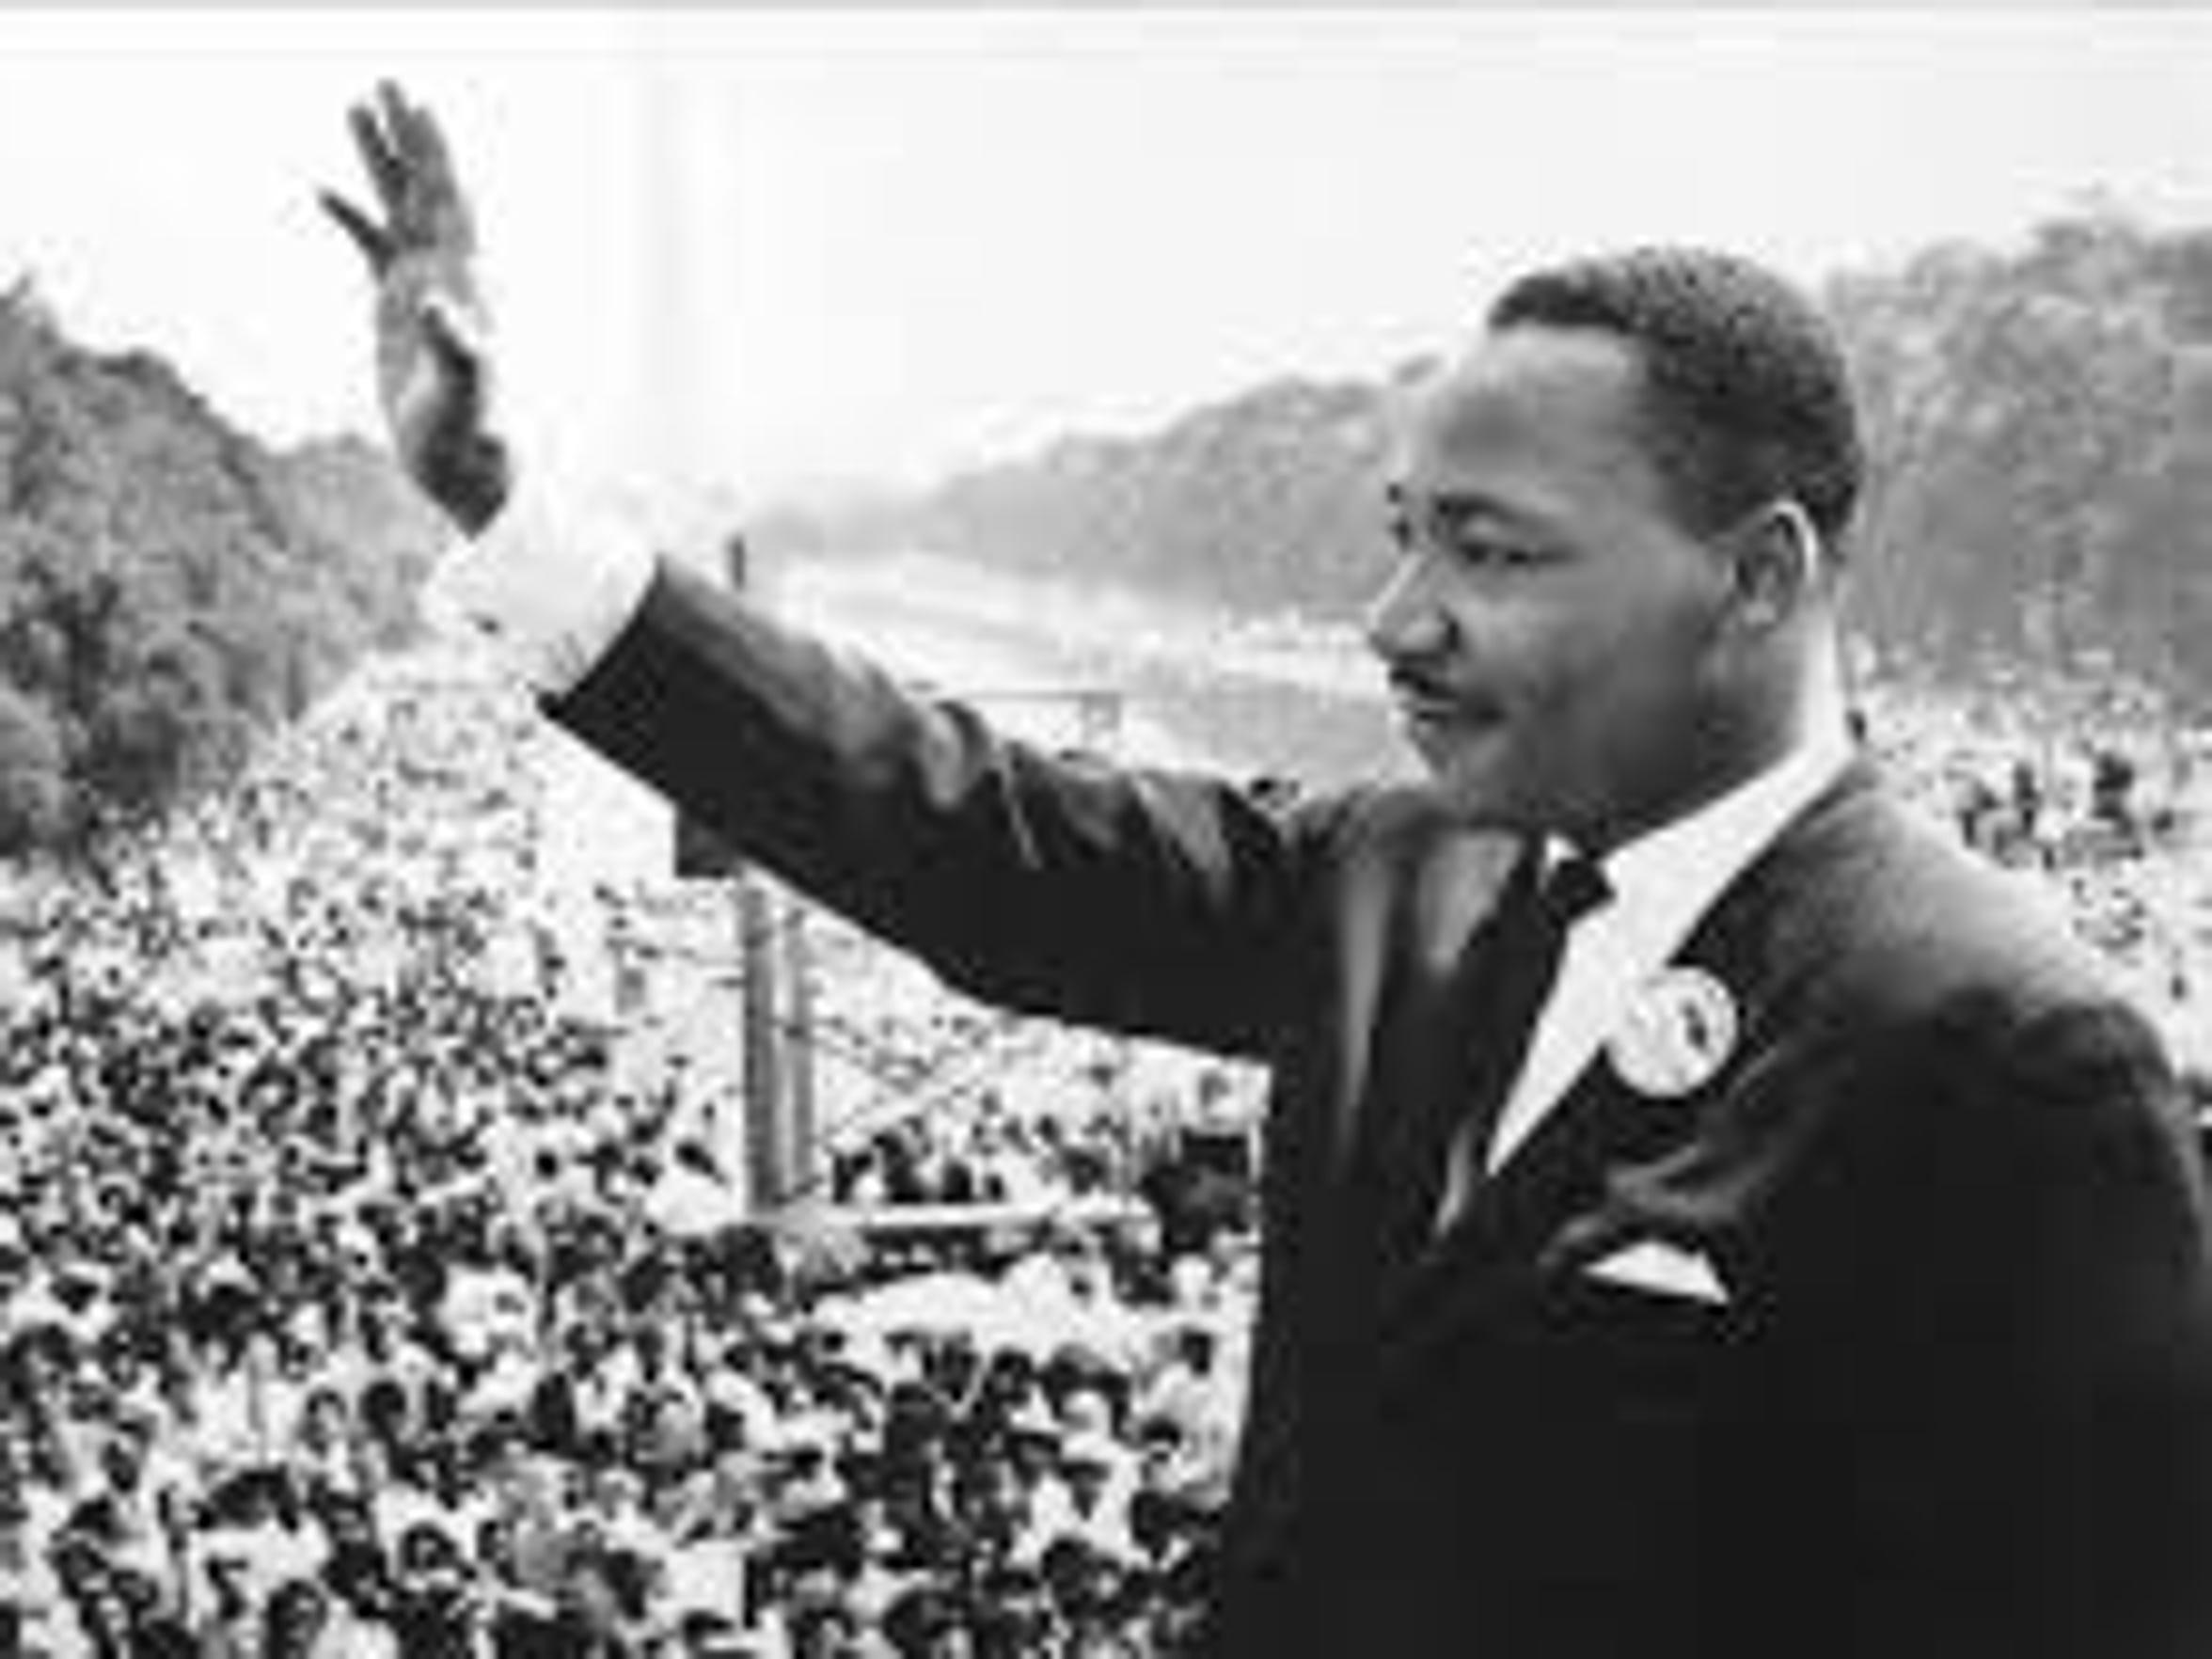 Martin Luther King Jr., spoke at the Washington D.C.,